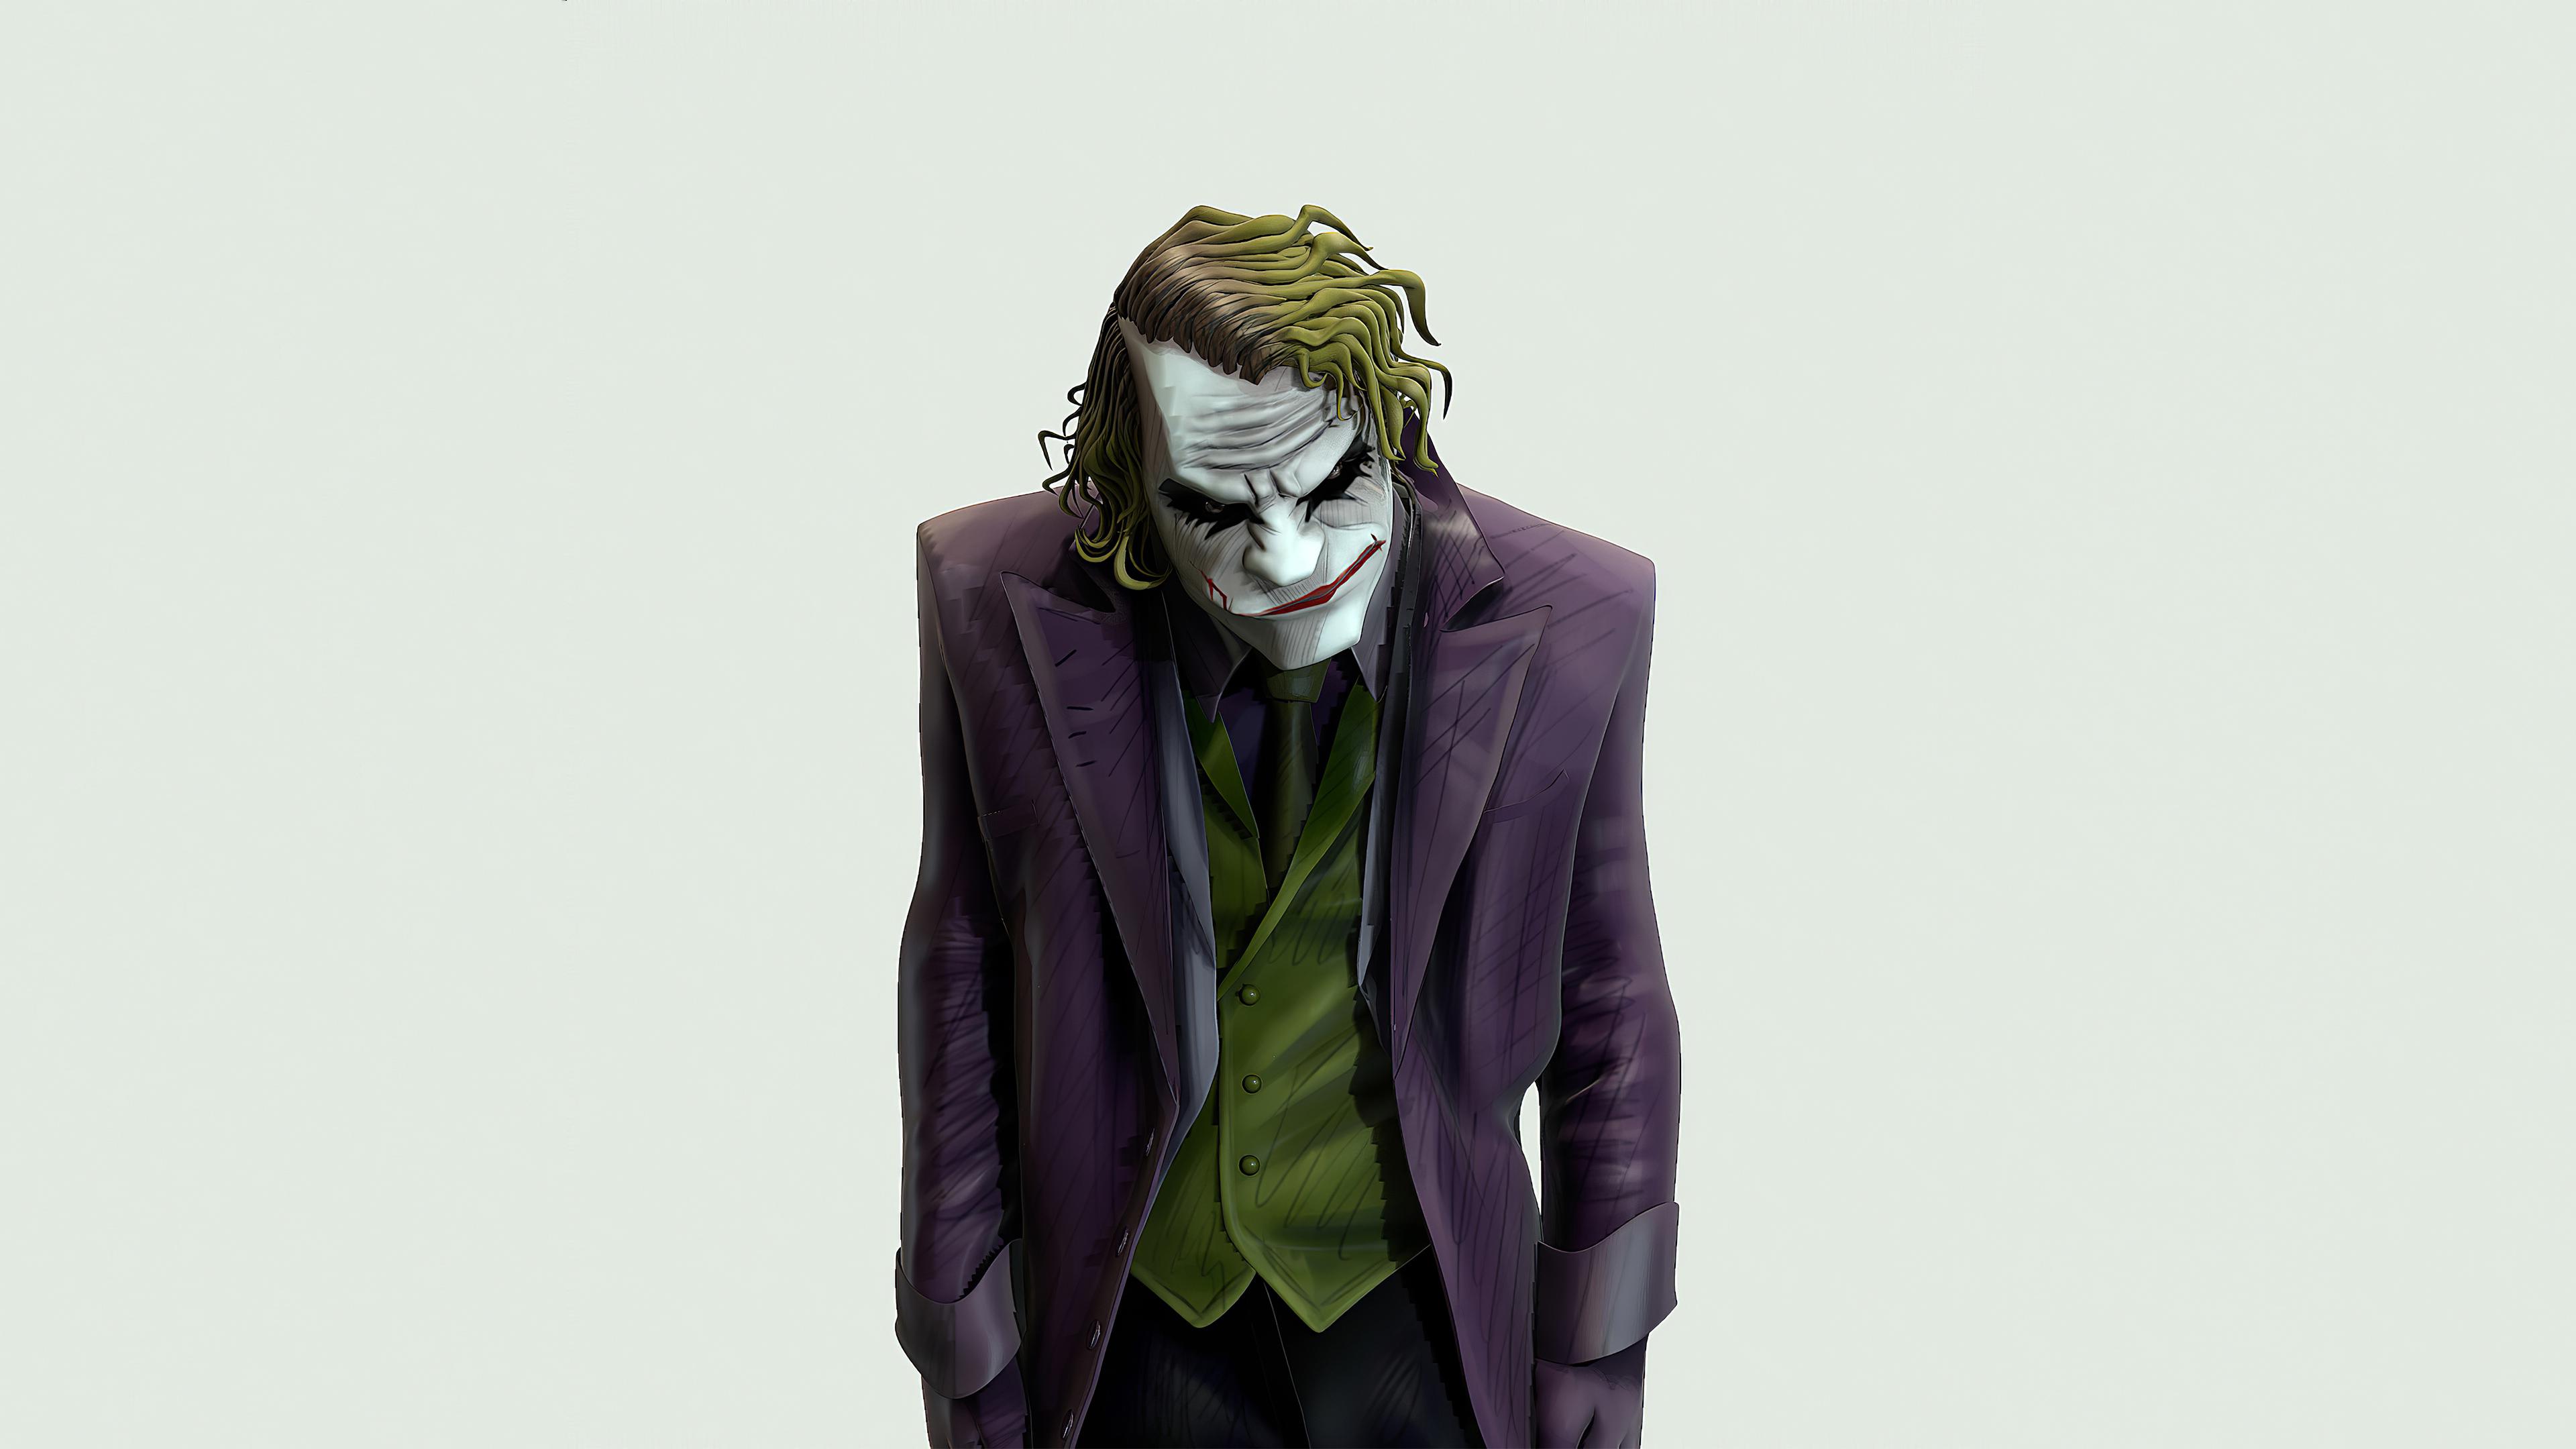 grumpy joker 1581357277 - Grumpy Joker - Grumpy Joker wallpapers, Grumpy Joker phone wallpapers, Grumpy Joker 4k wallpapers